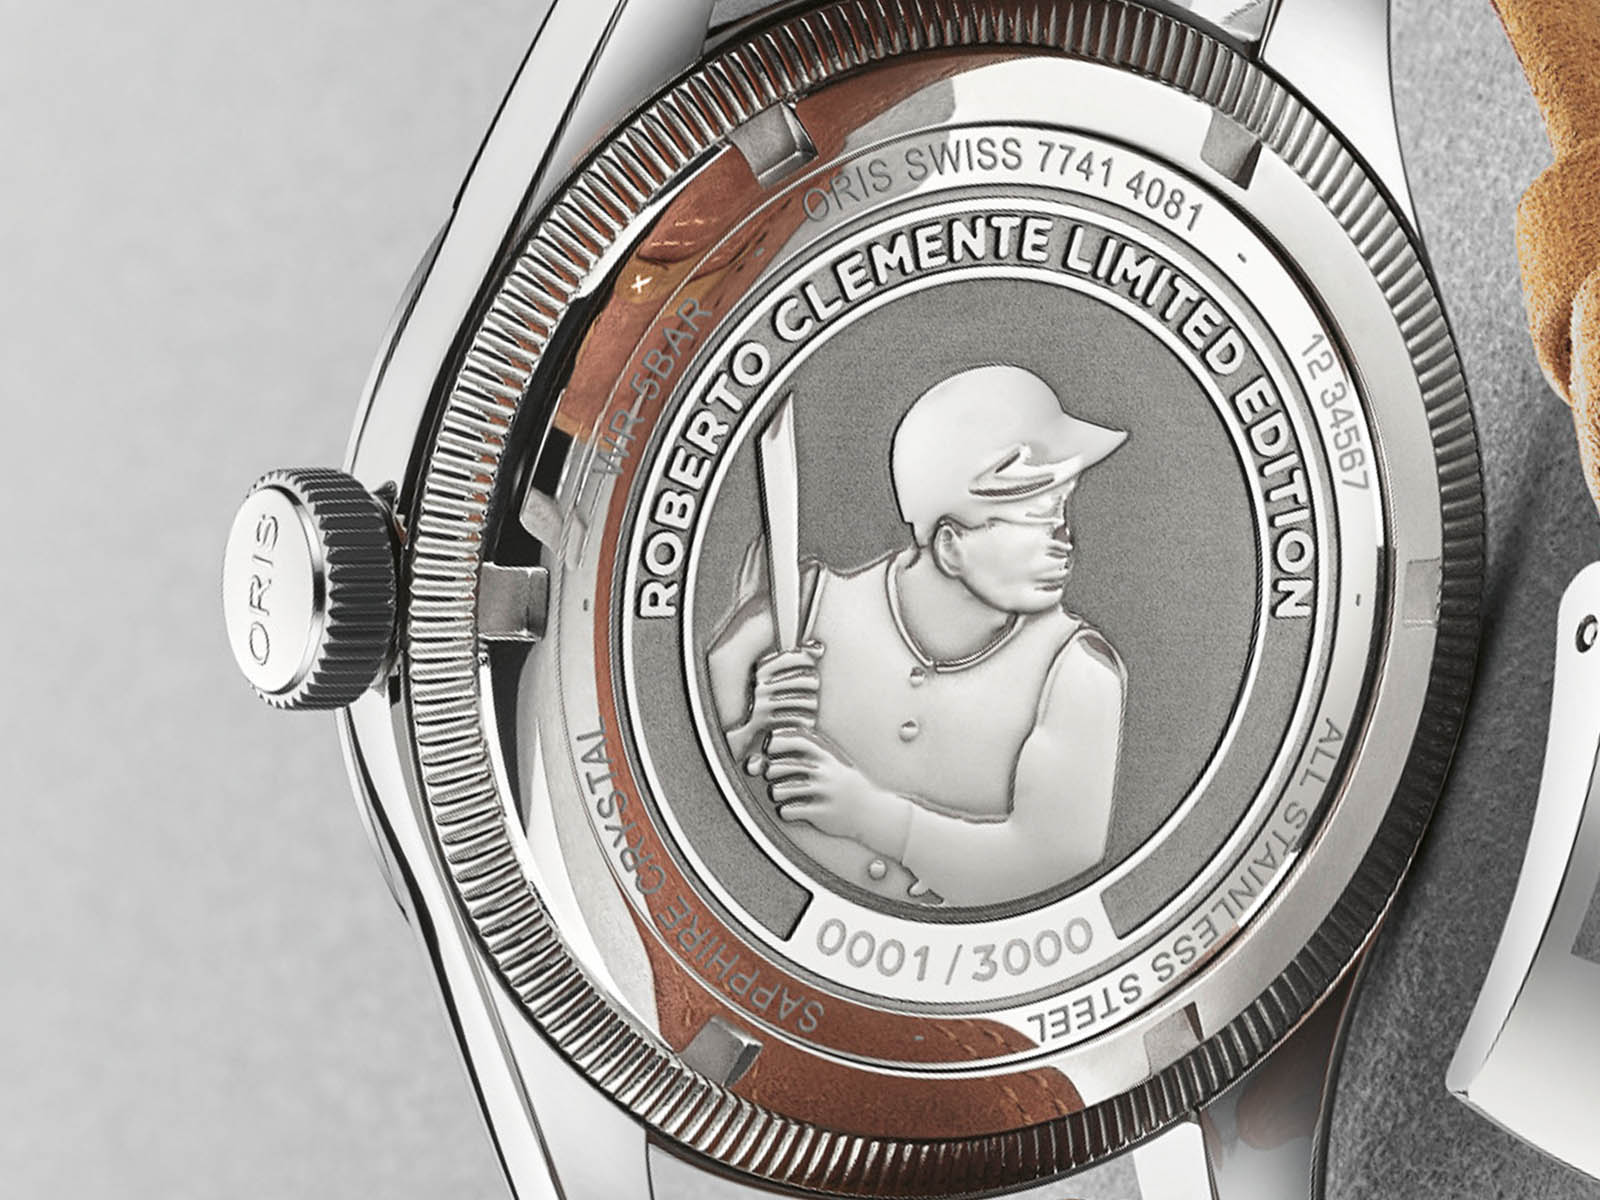 01-754-7741-4081-set-oris-roberto-clemente-limited-edition-10.jpg